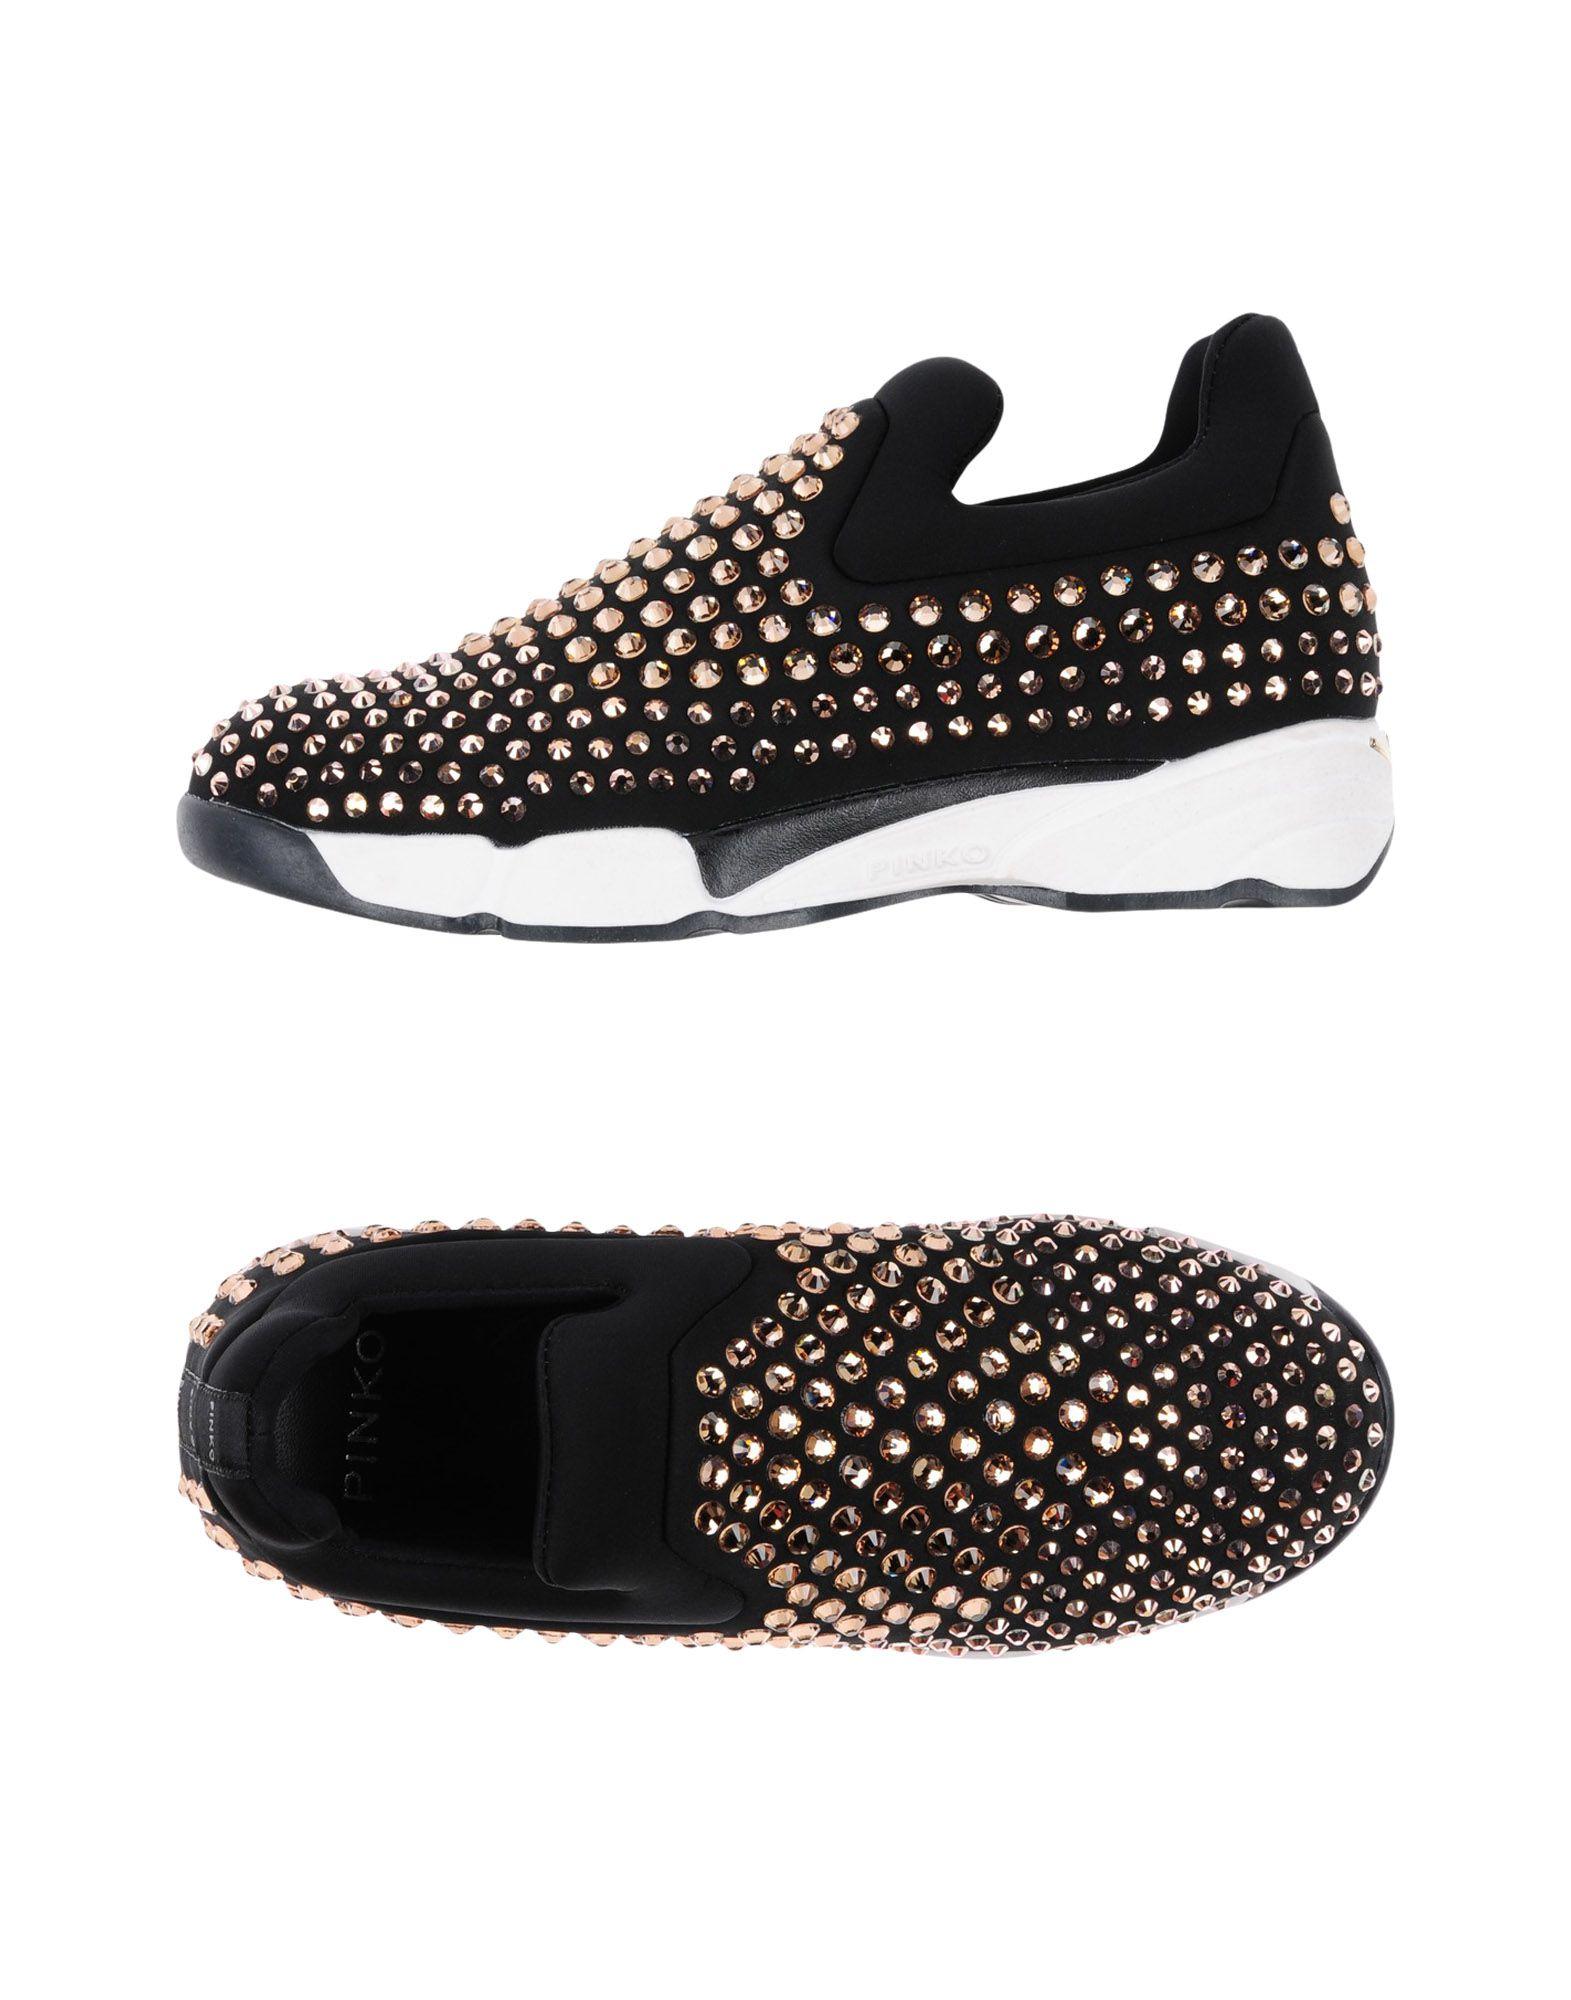 Zapatillas Pinko Mujer - Zapatillas Pinko  Negro Negro  99908c